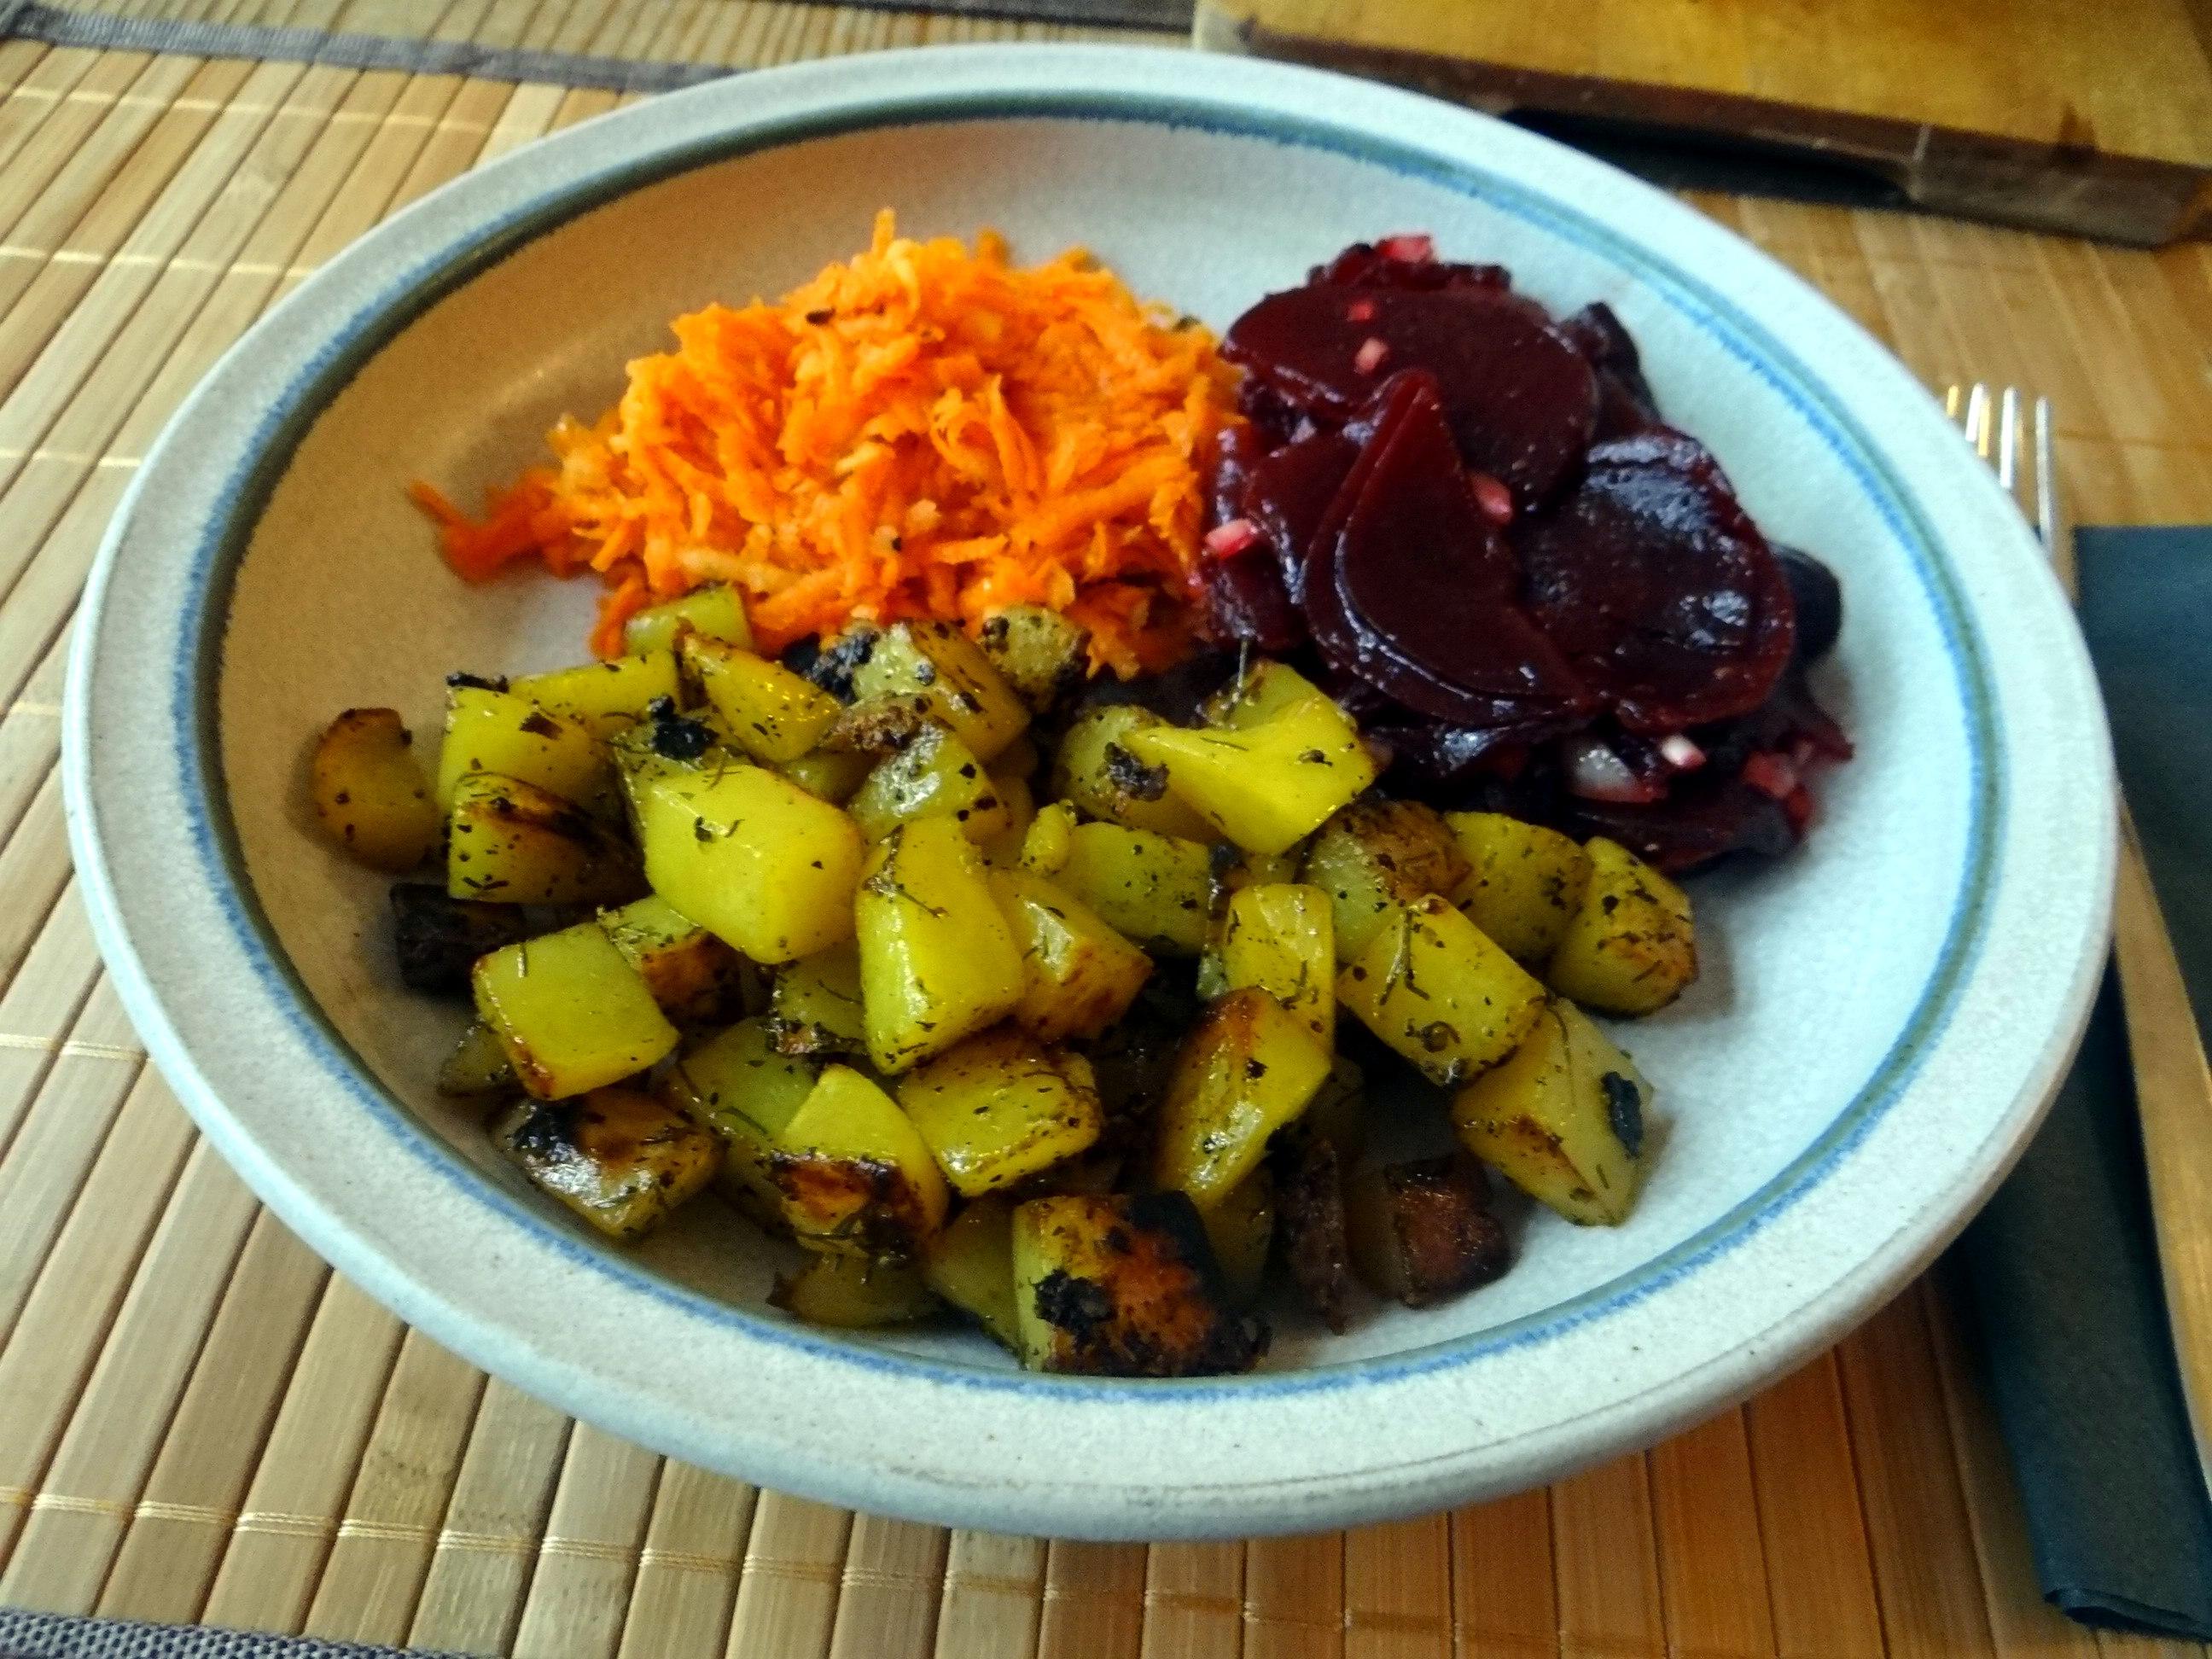 Rohgebratene Kartoffeln,Möhrensalat,Rote Bete Salat (16)